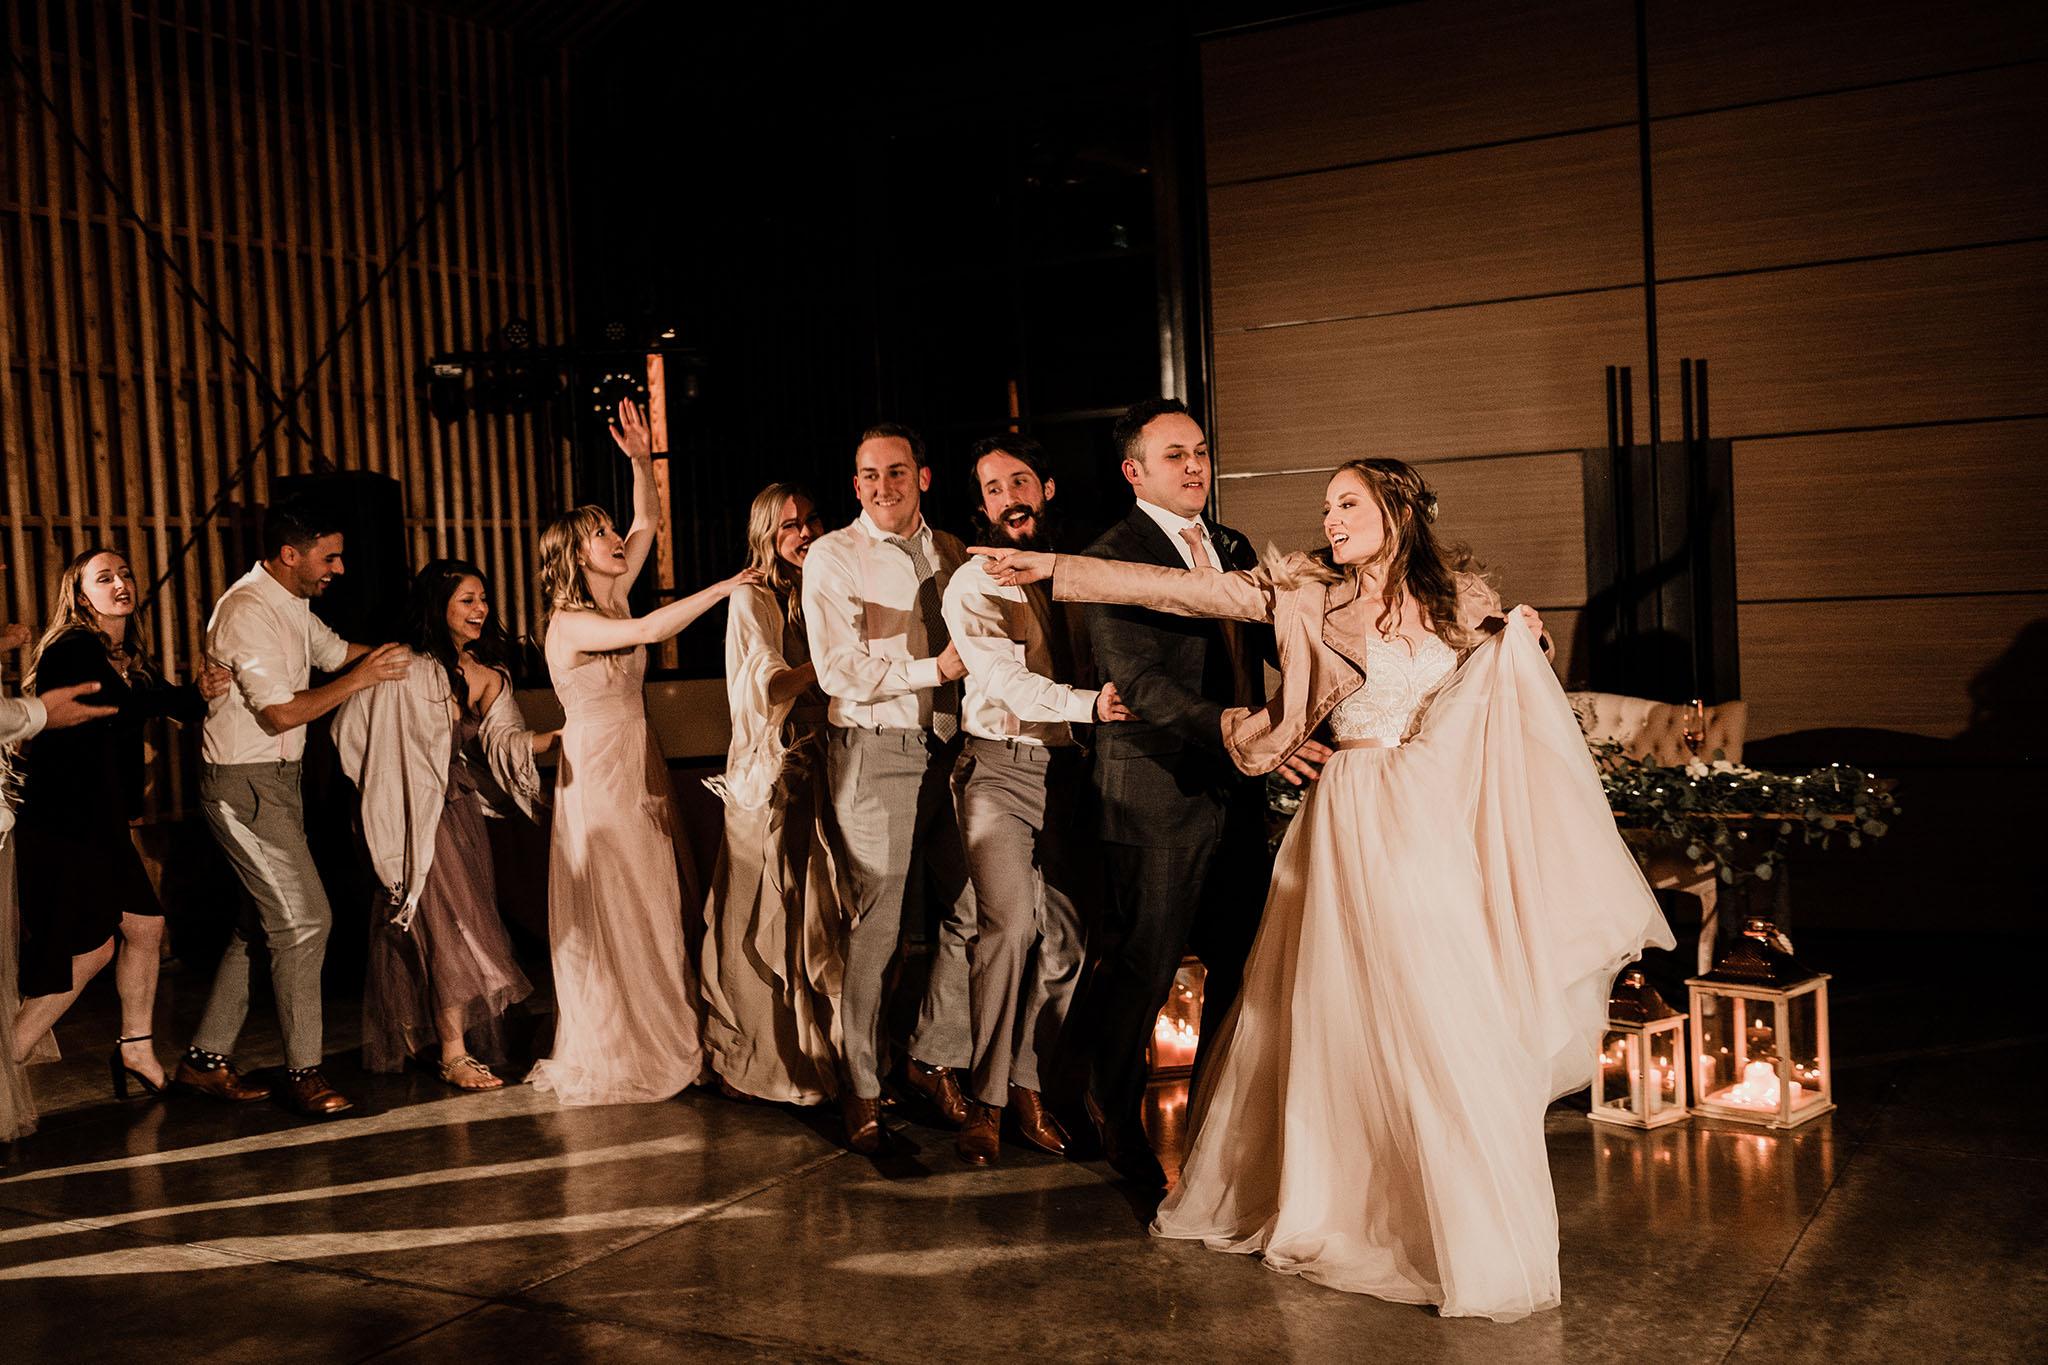 Arizona-Wedding-Photographer-The-Paseo-Venue51.jpg